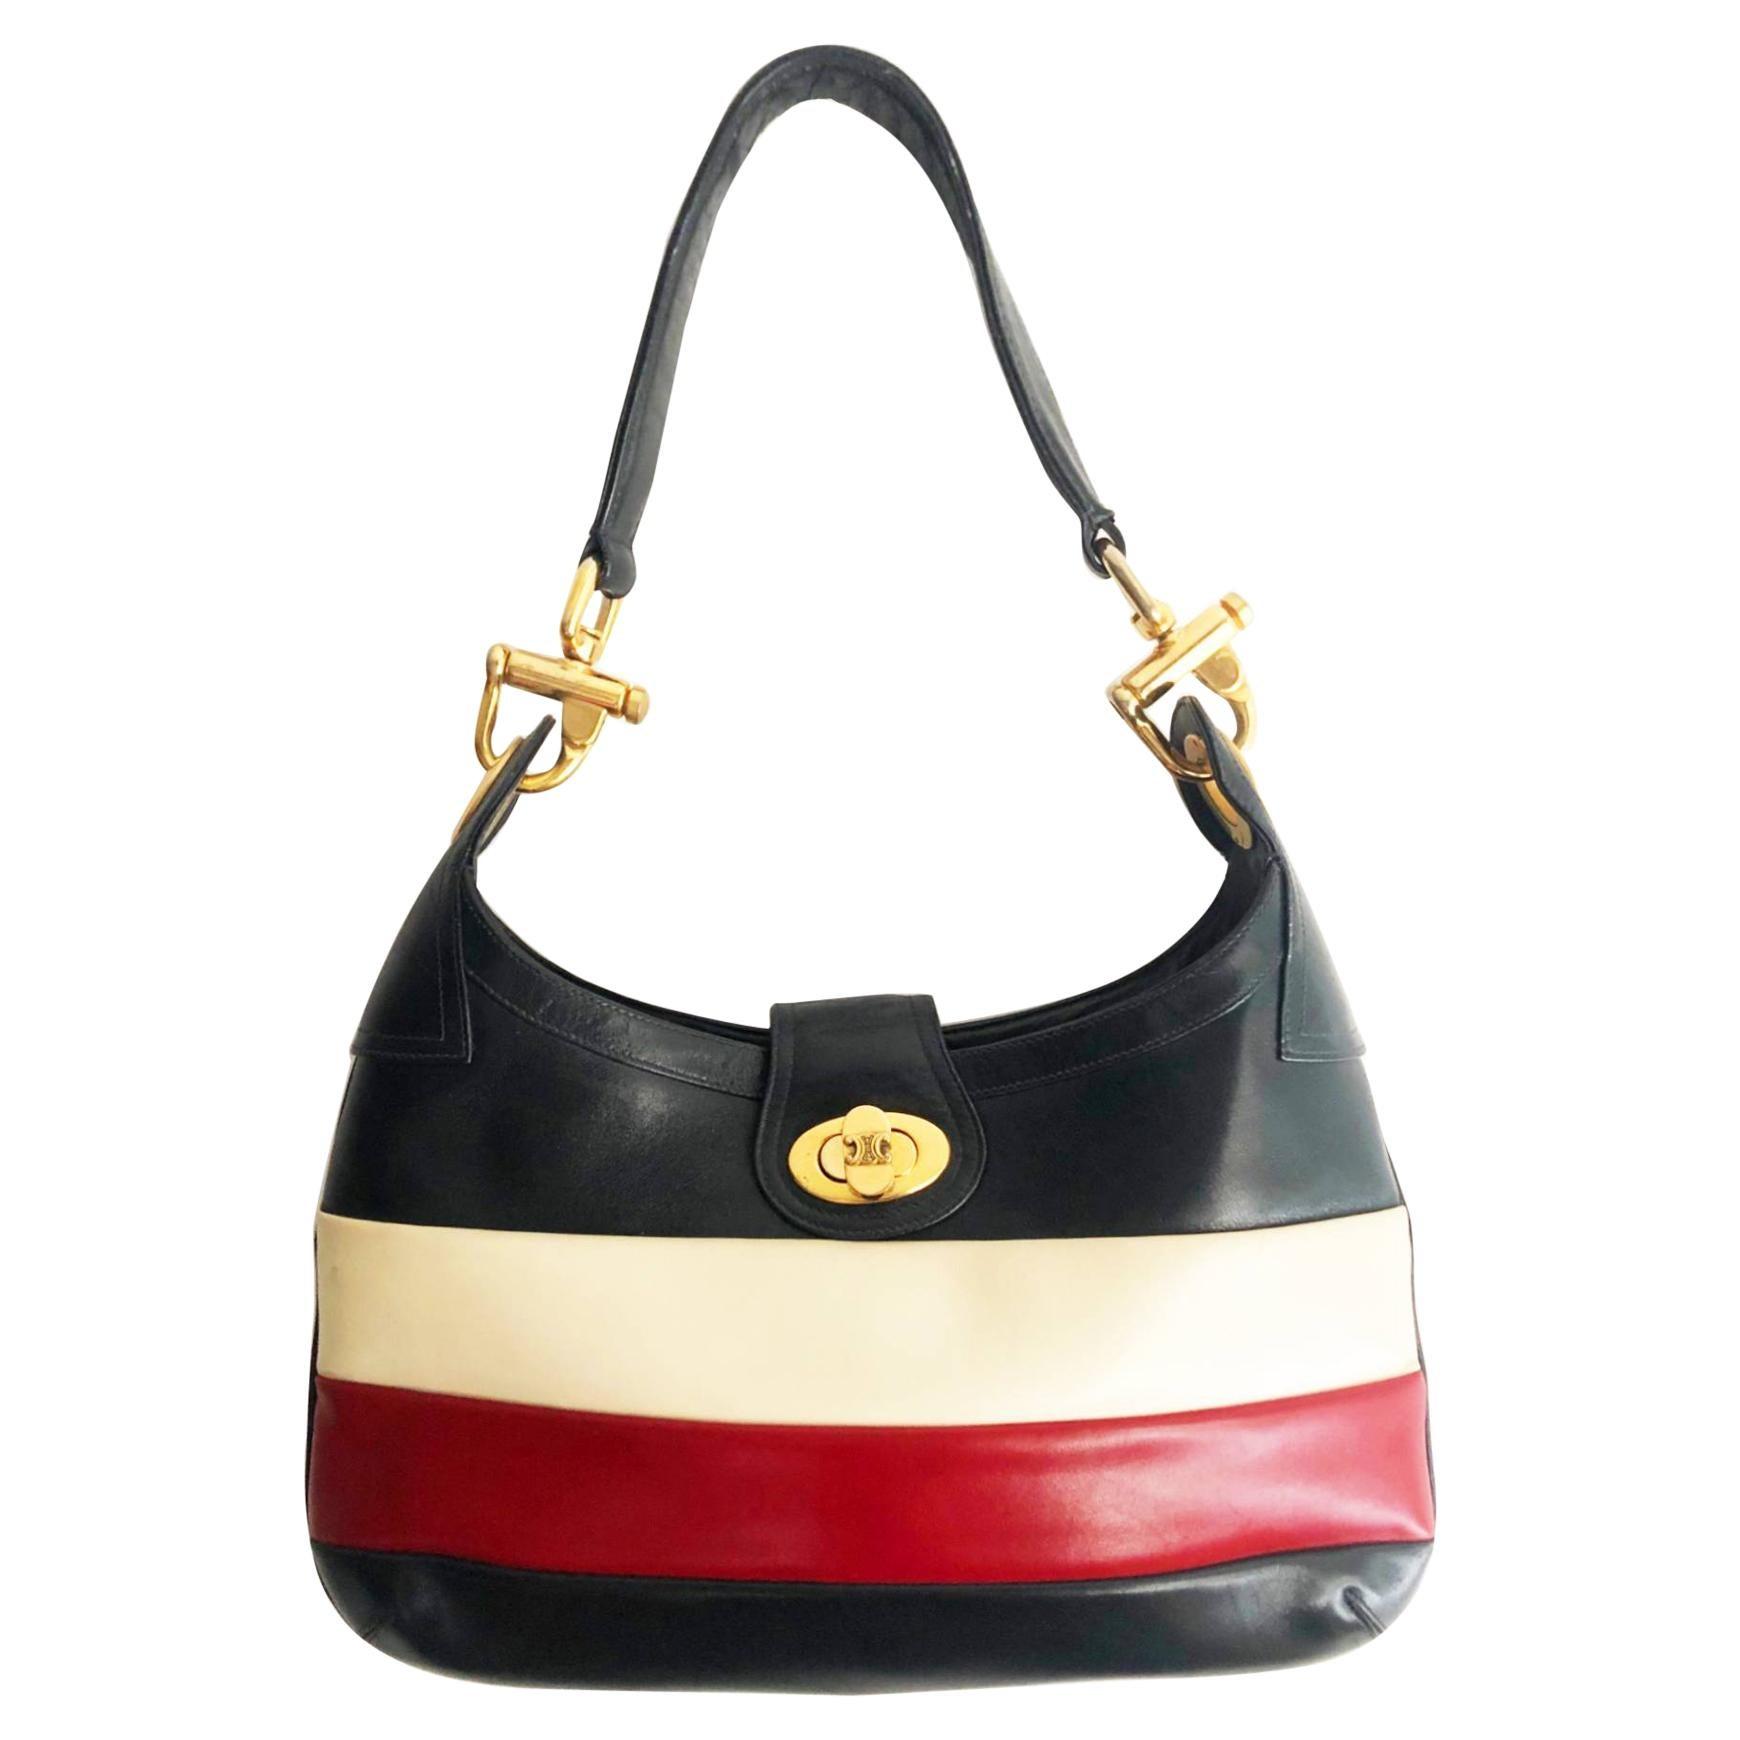 1970s Celine Paris Multi Color Tote Leather Bag